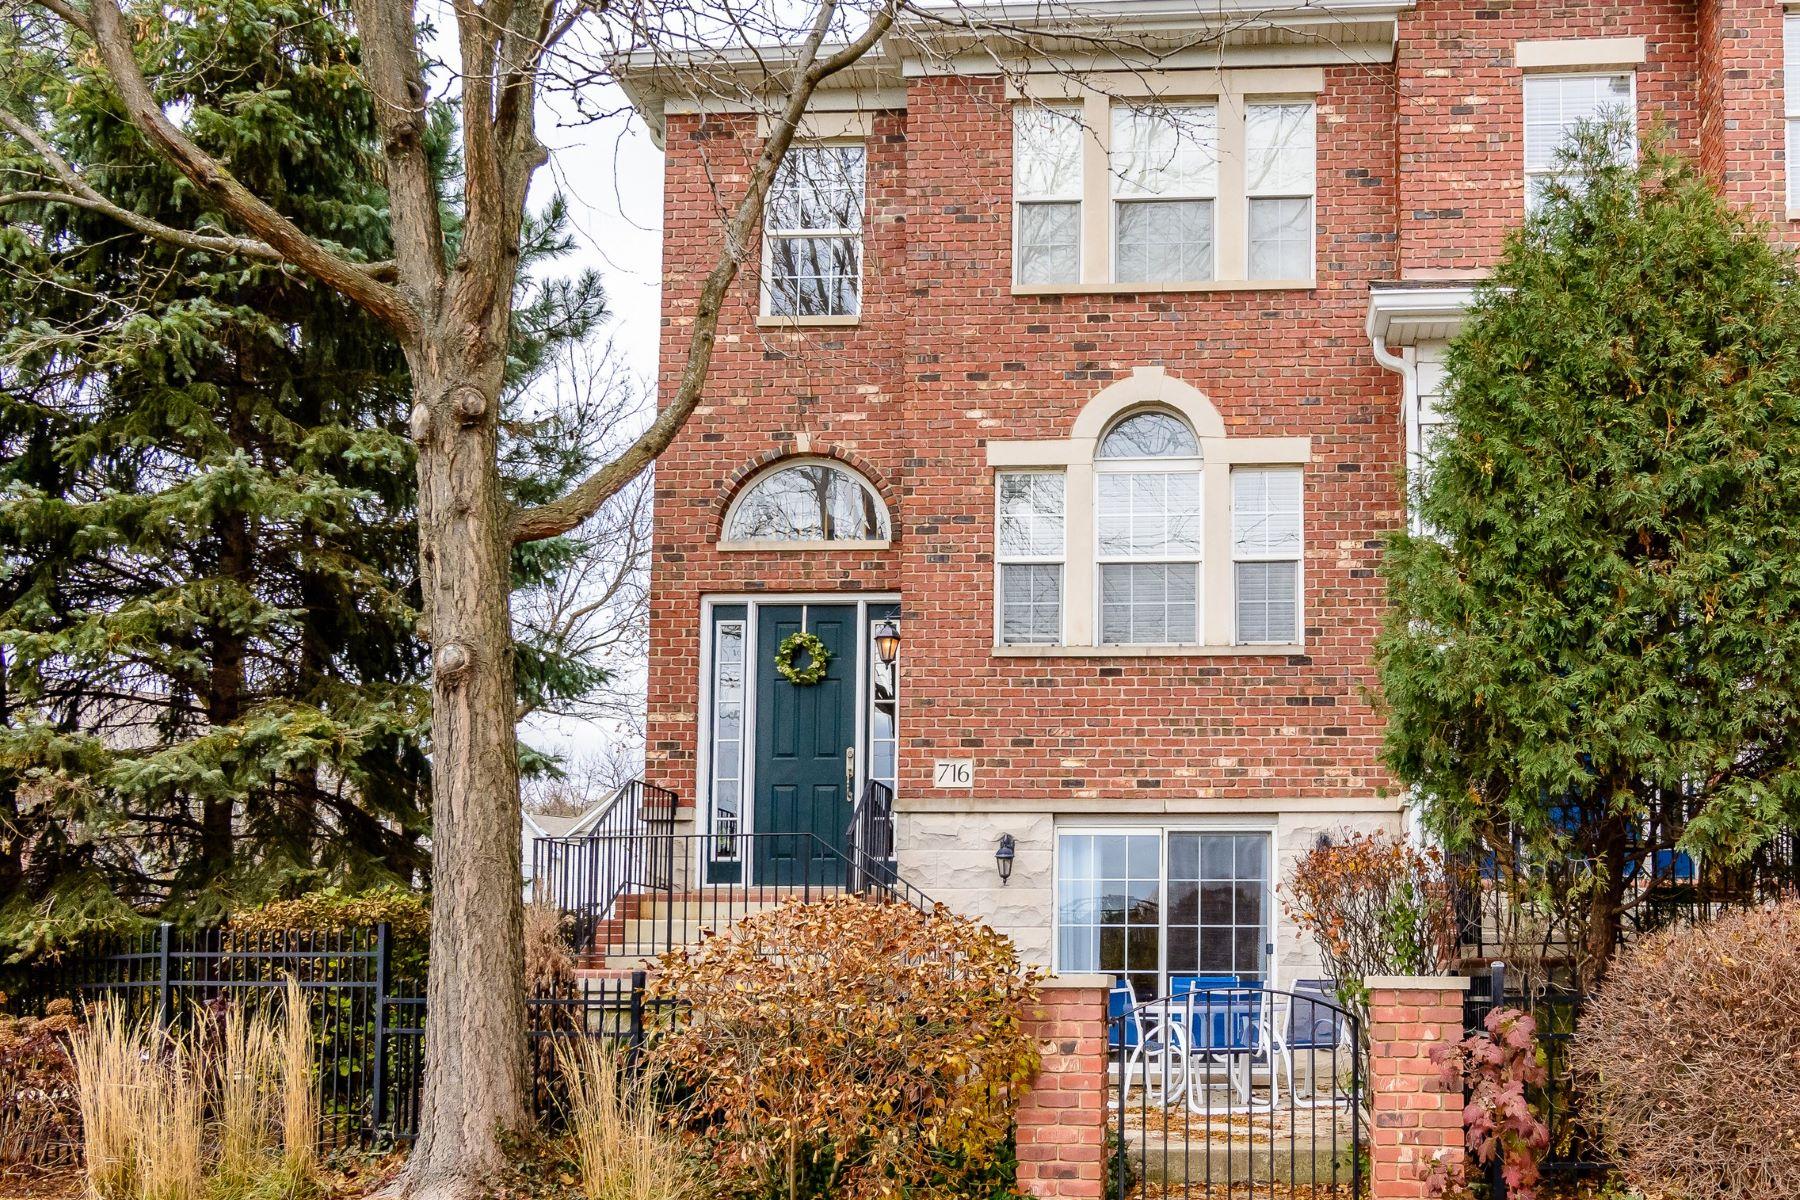 Single Family Home for Sale at 716 Prescott Naperville, Illinois, 60563 United States